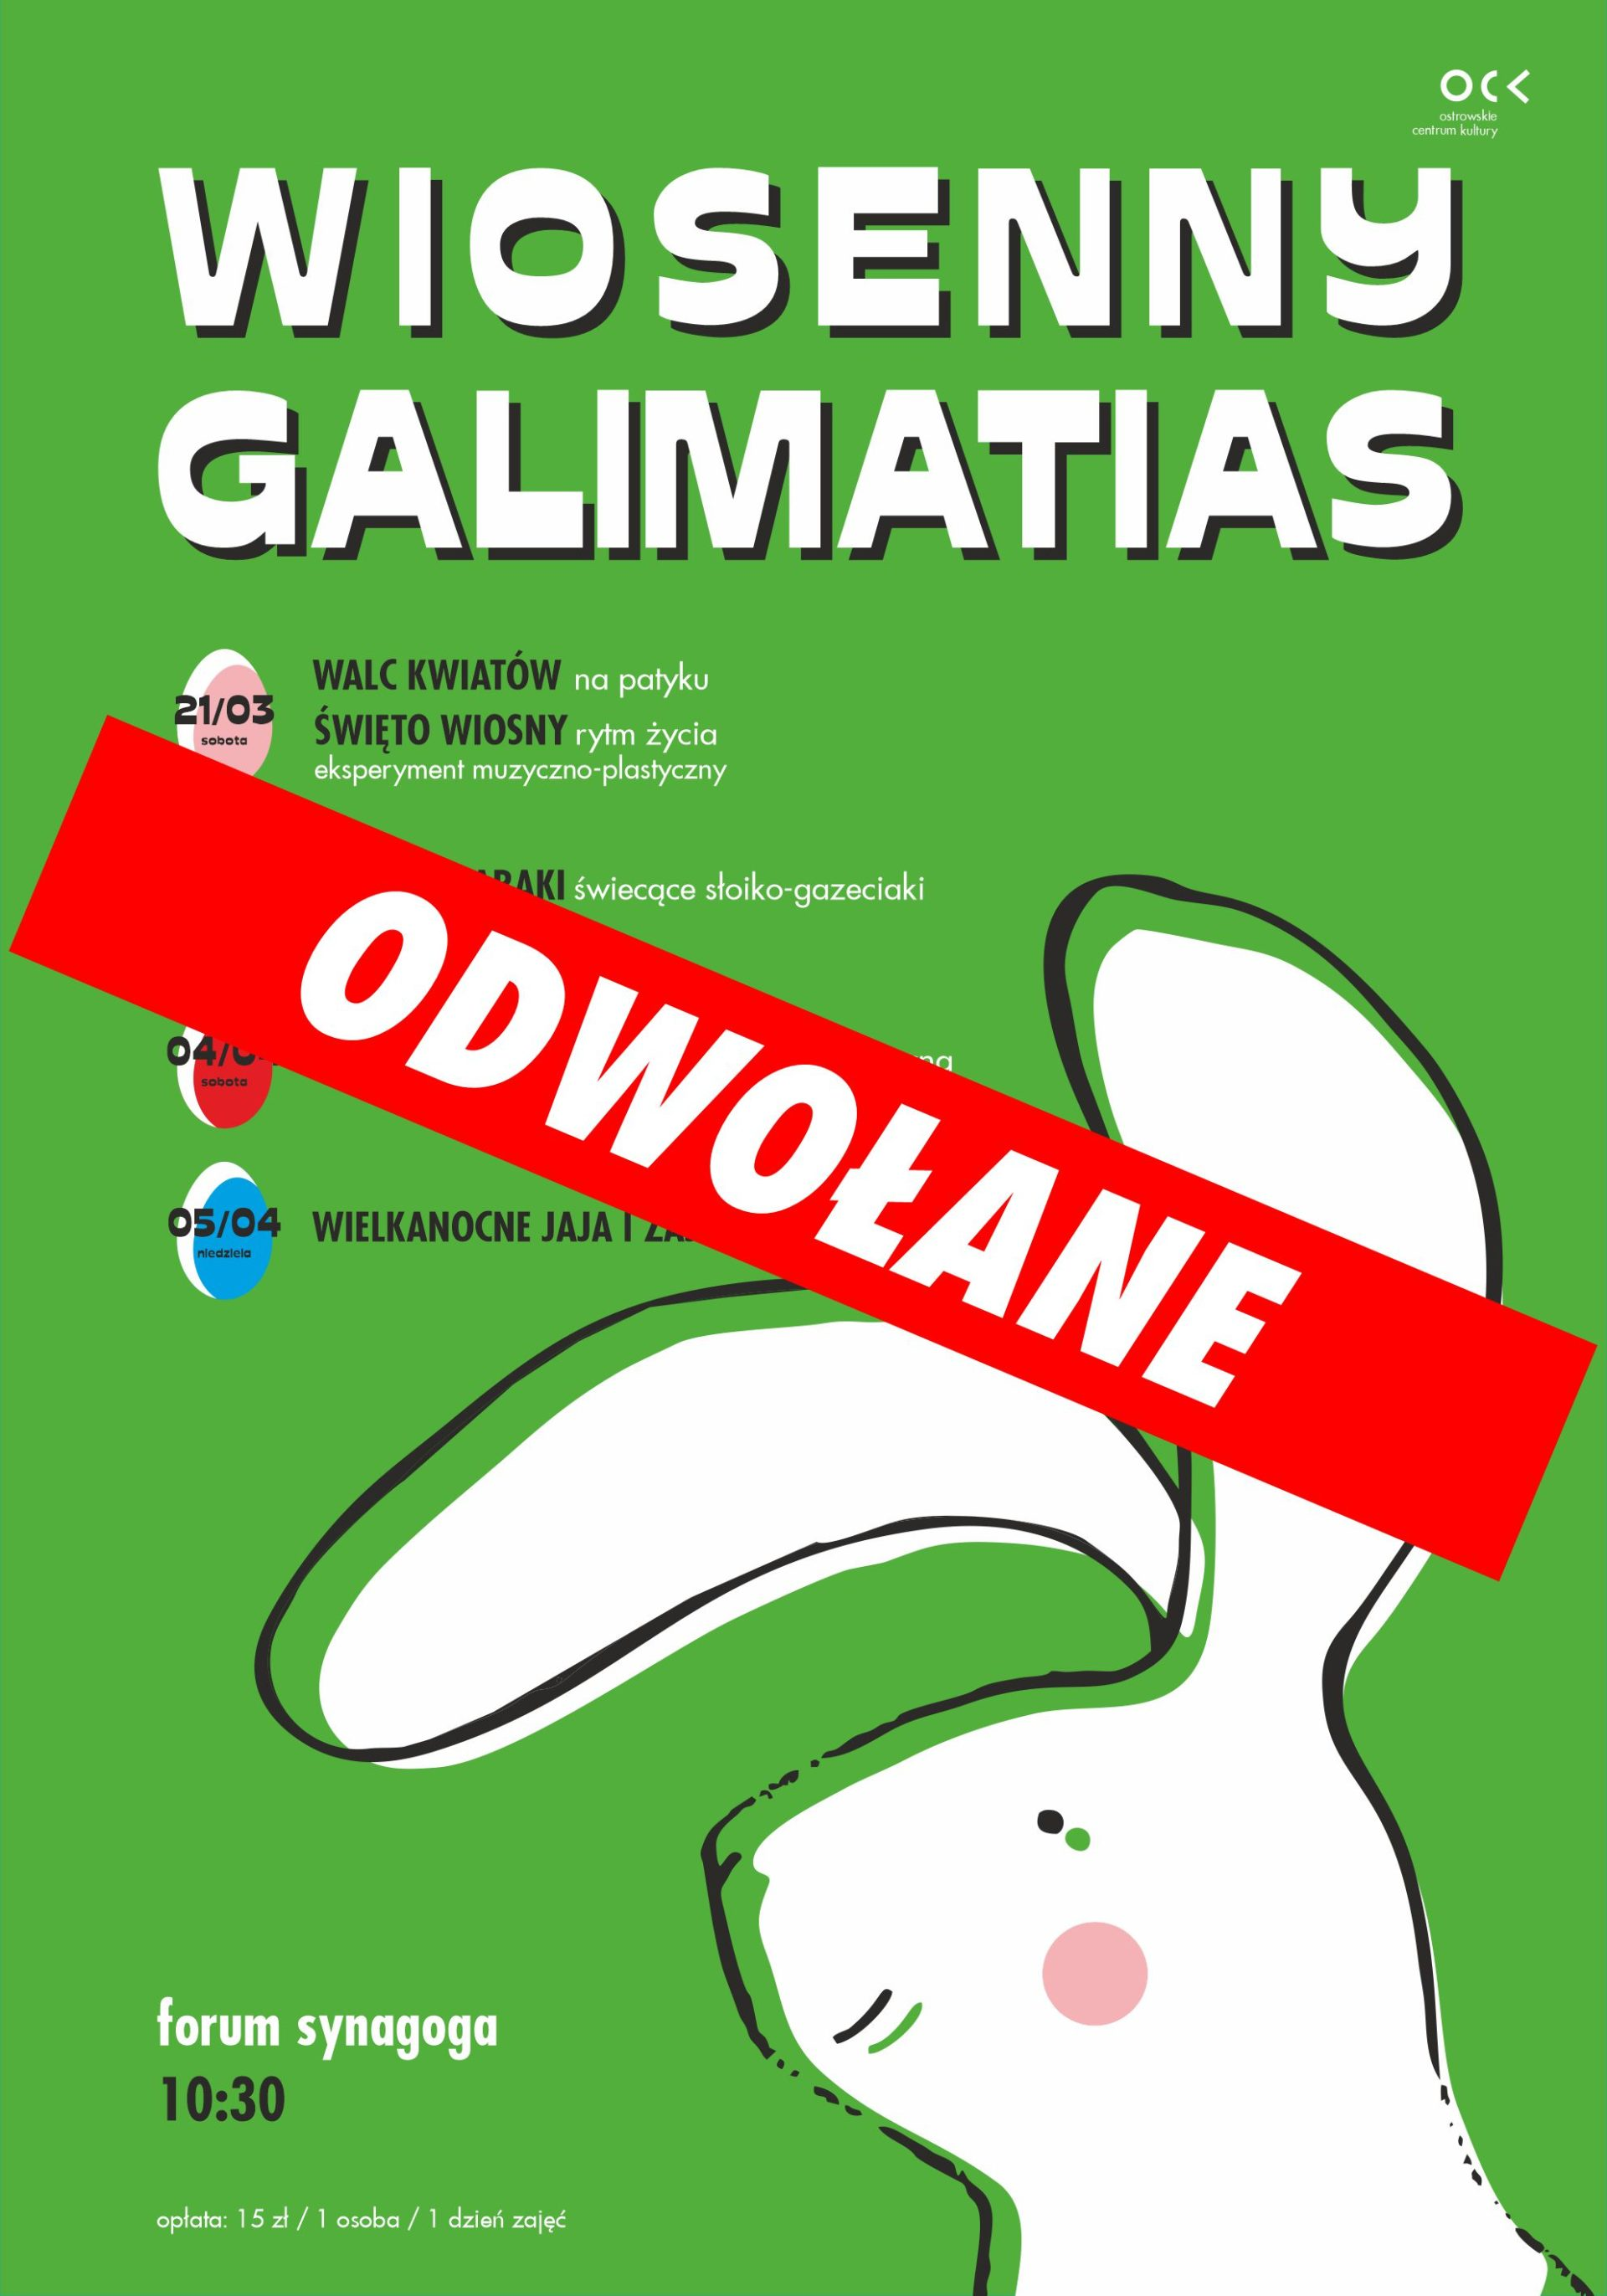 WIOSENNY GALIMATIAS